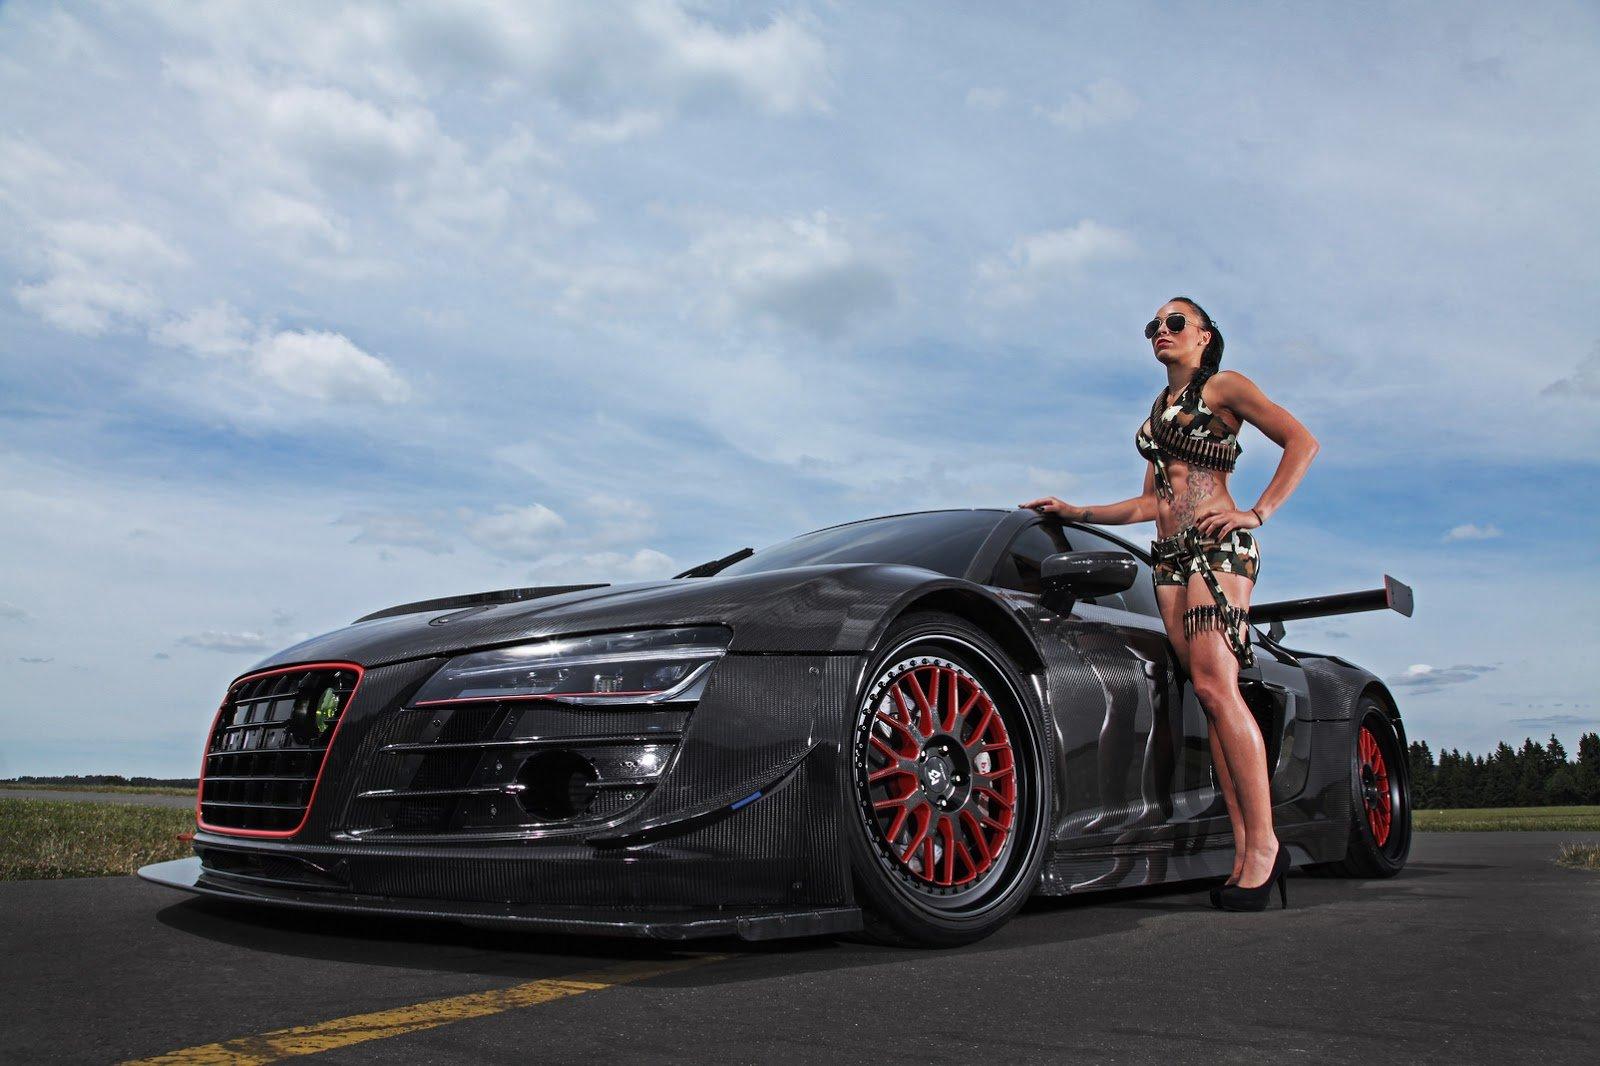 Audi R8 V10 Plus Widebody Cars Carbon Modified Wallpaper